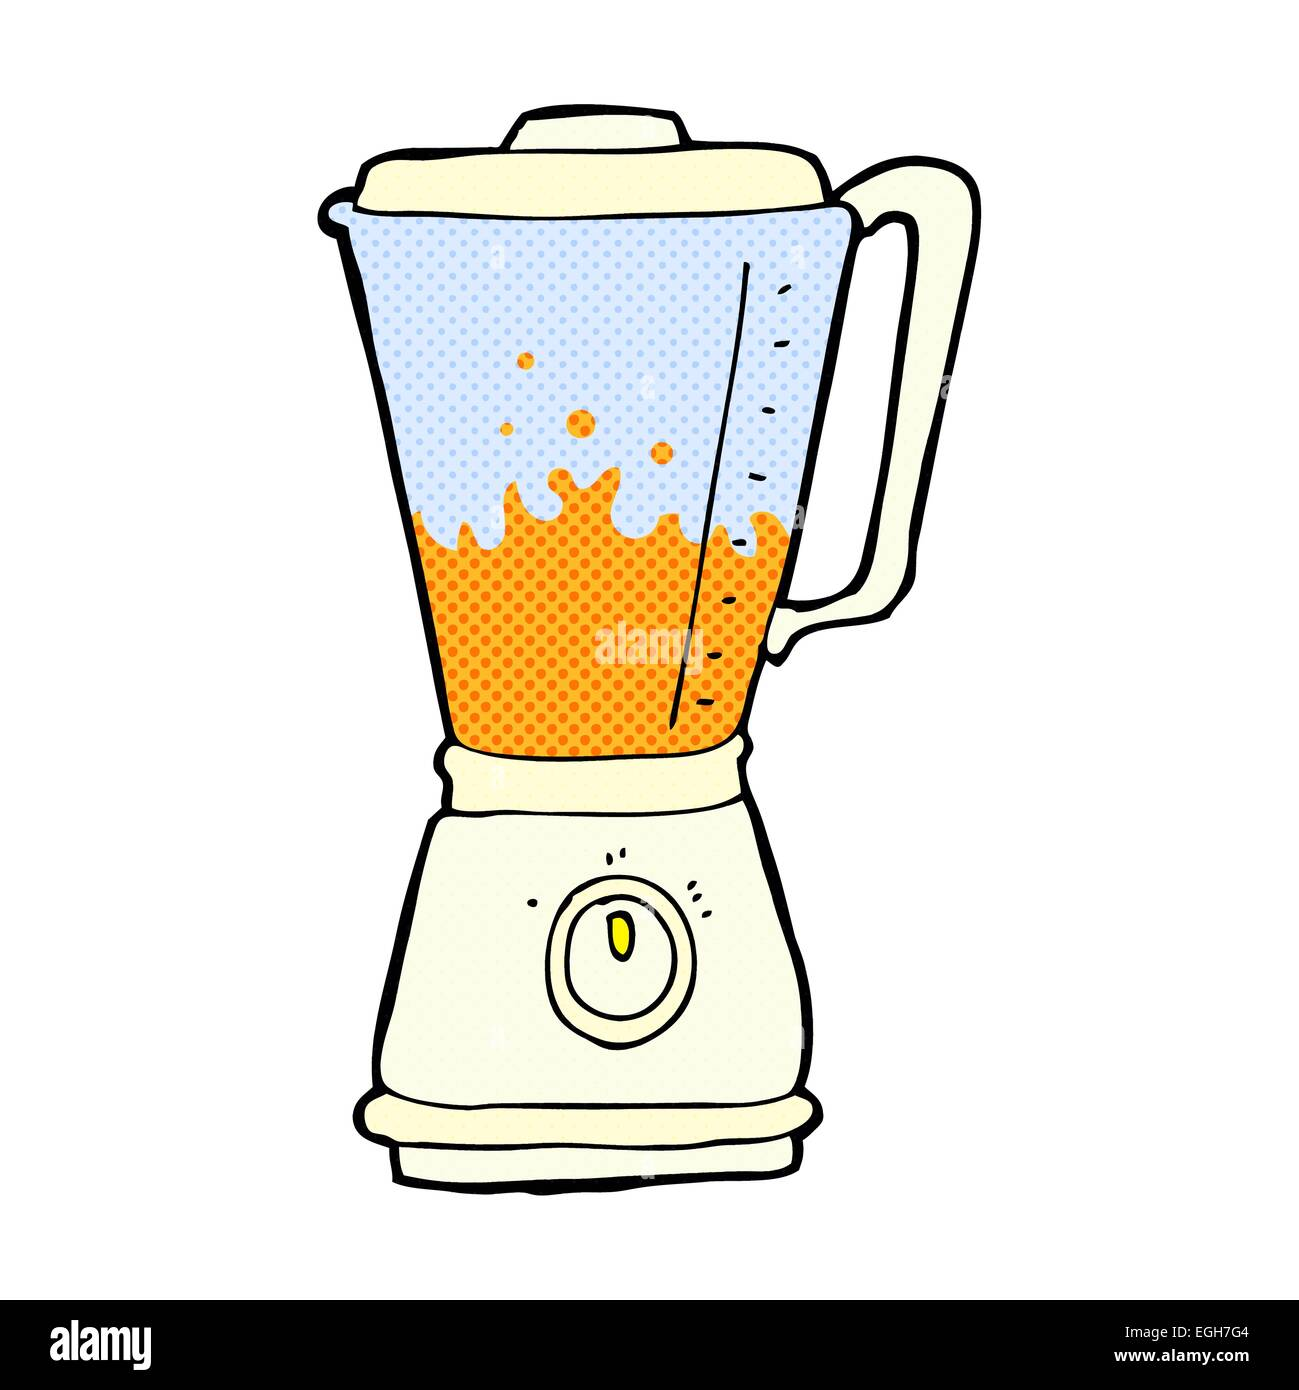 Cartoon Food Processor ~ Cartoon juice blender stock vector art illustration